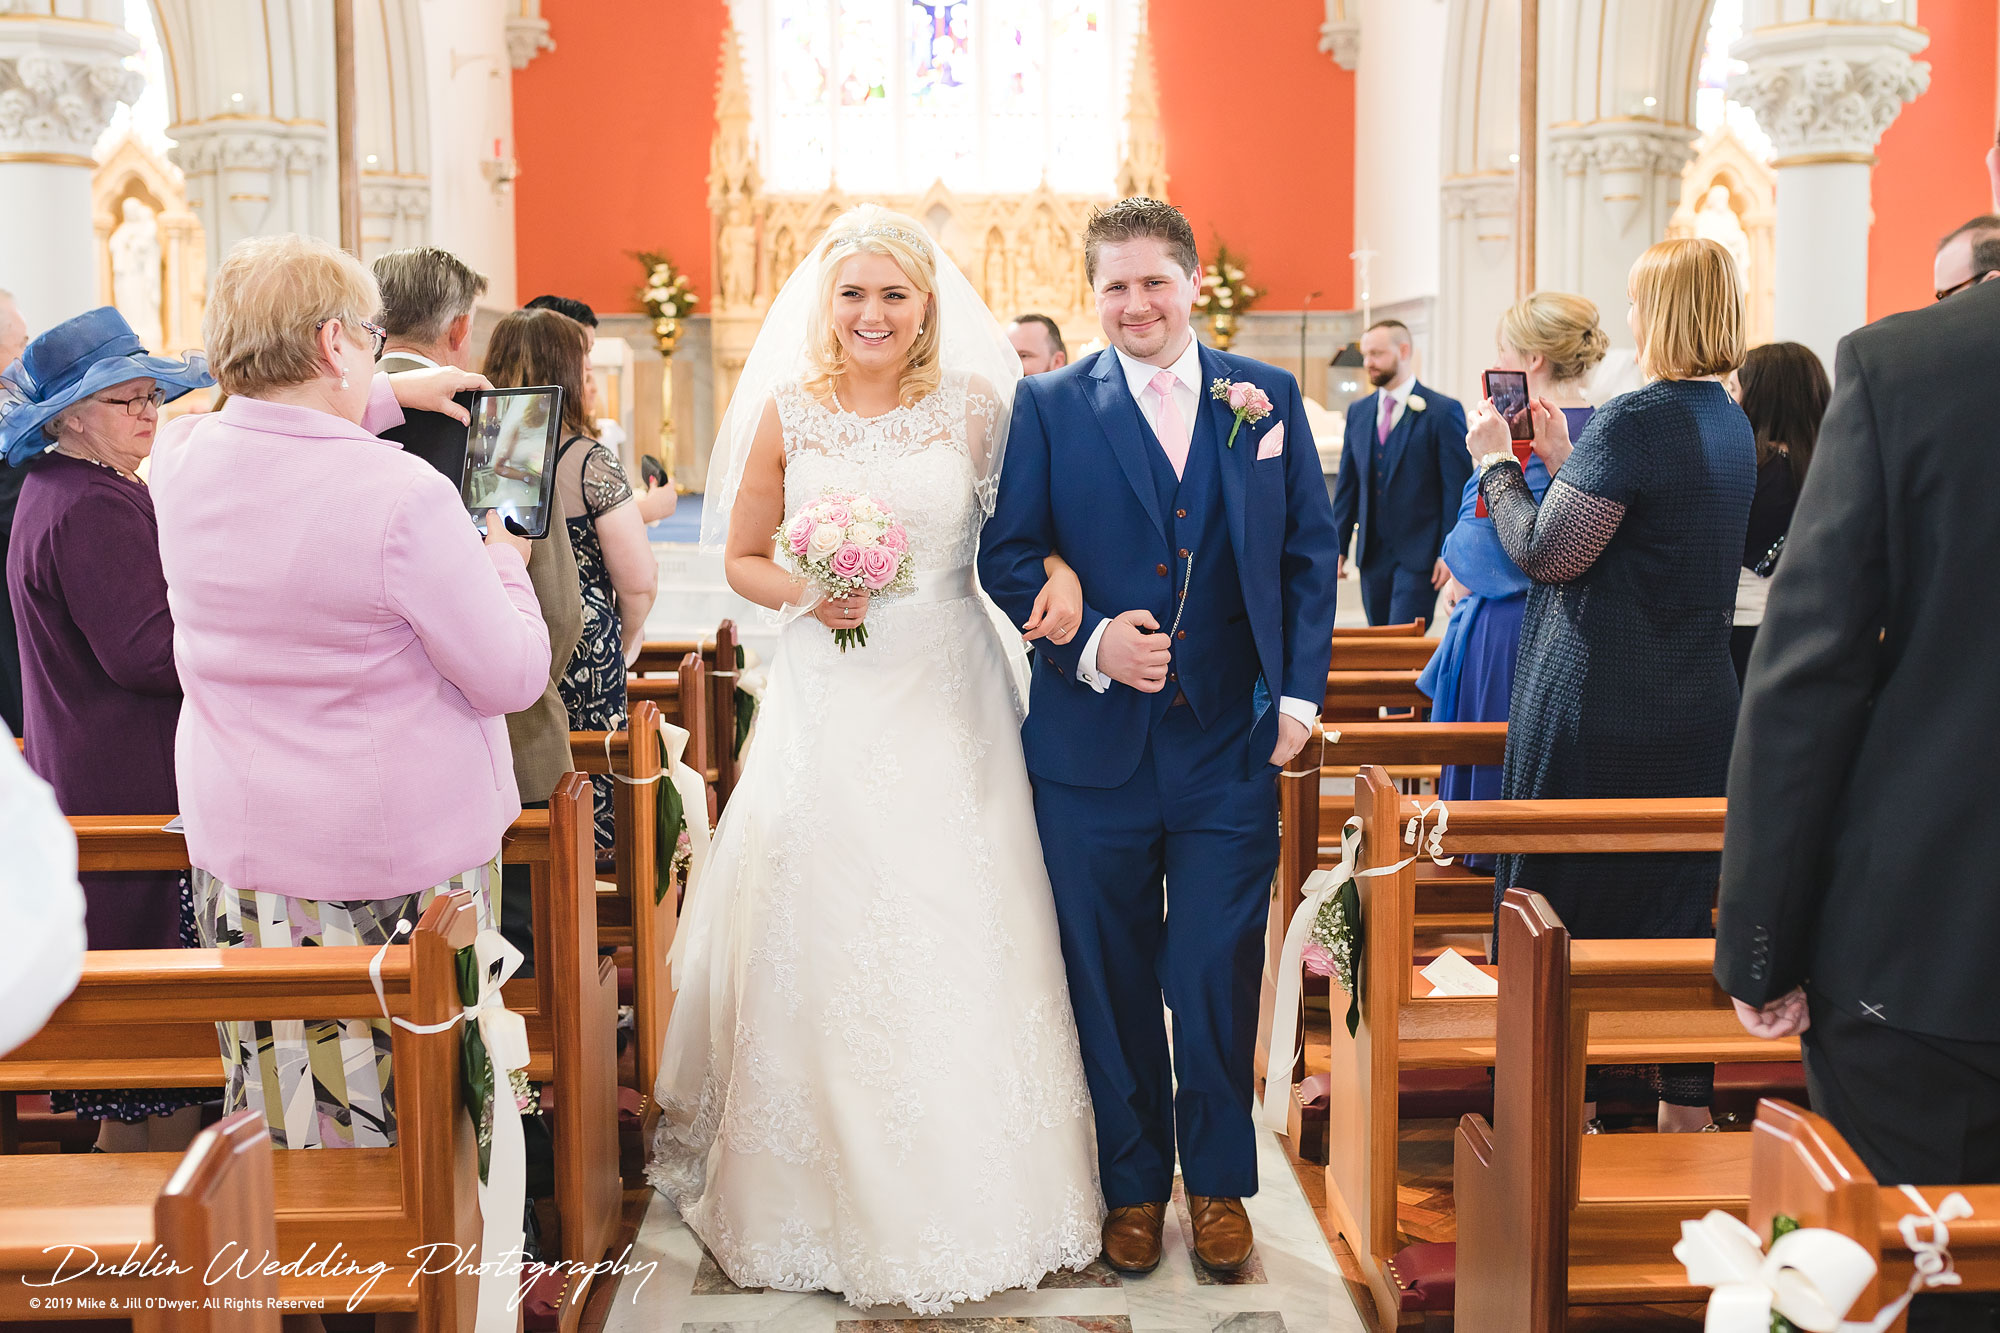 wedding-photographer-wicklow-glenview-hotel-KS028.jpg